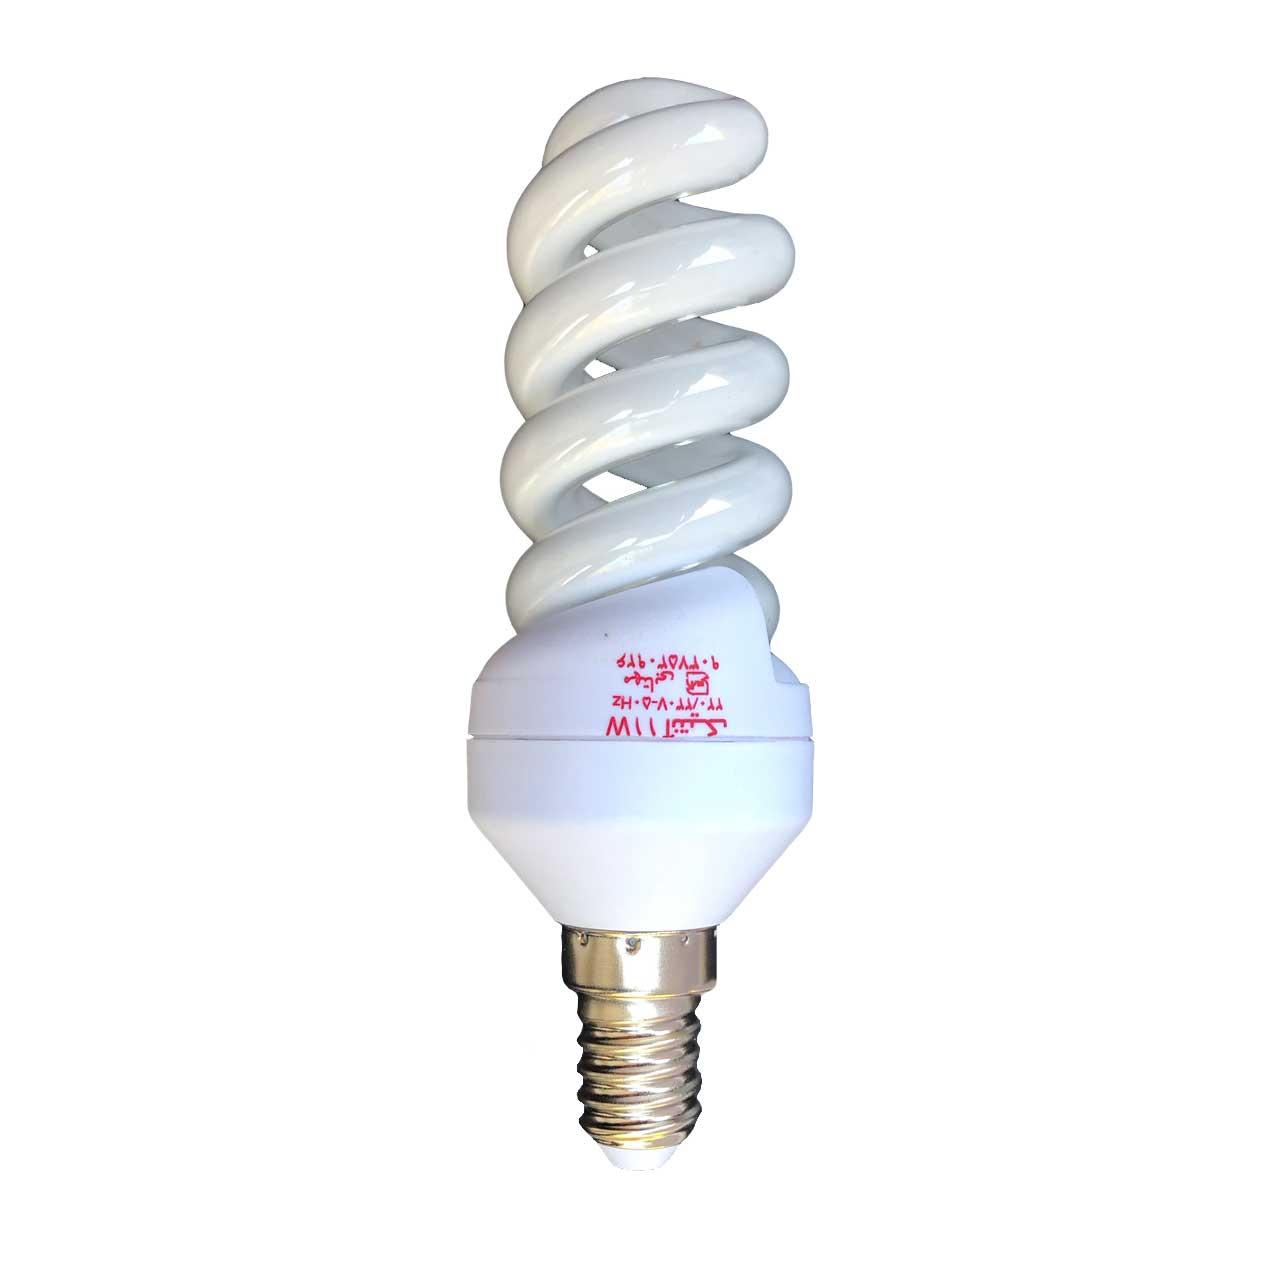 لامپ کم مصرف 11 وات آنتیک مدل تمام پیچ پایه E14